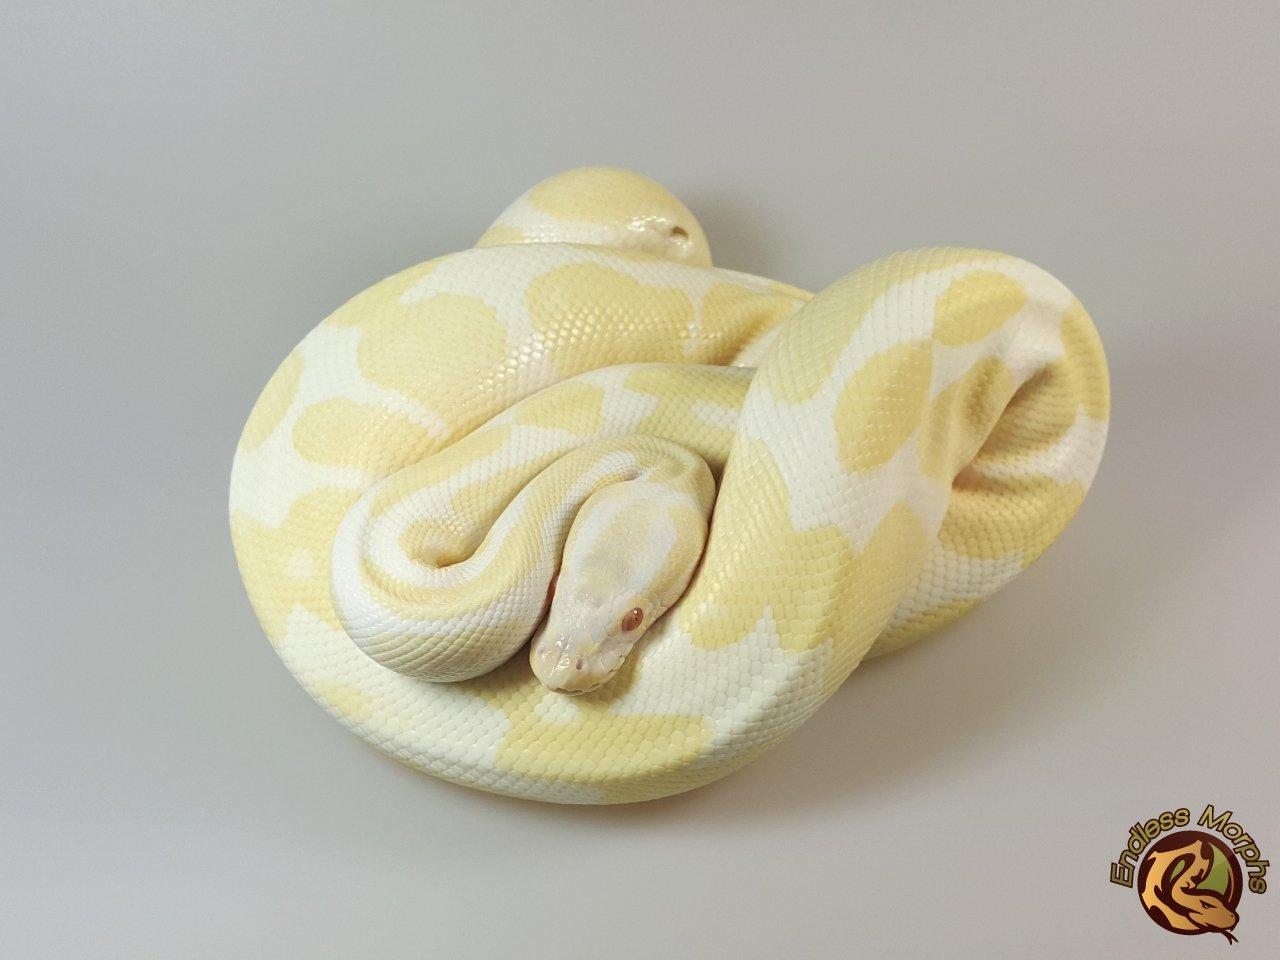 1.0 Albino Het. Axanthic - VPI Line Königspython